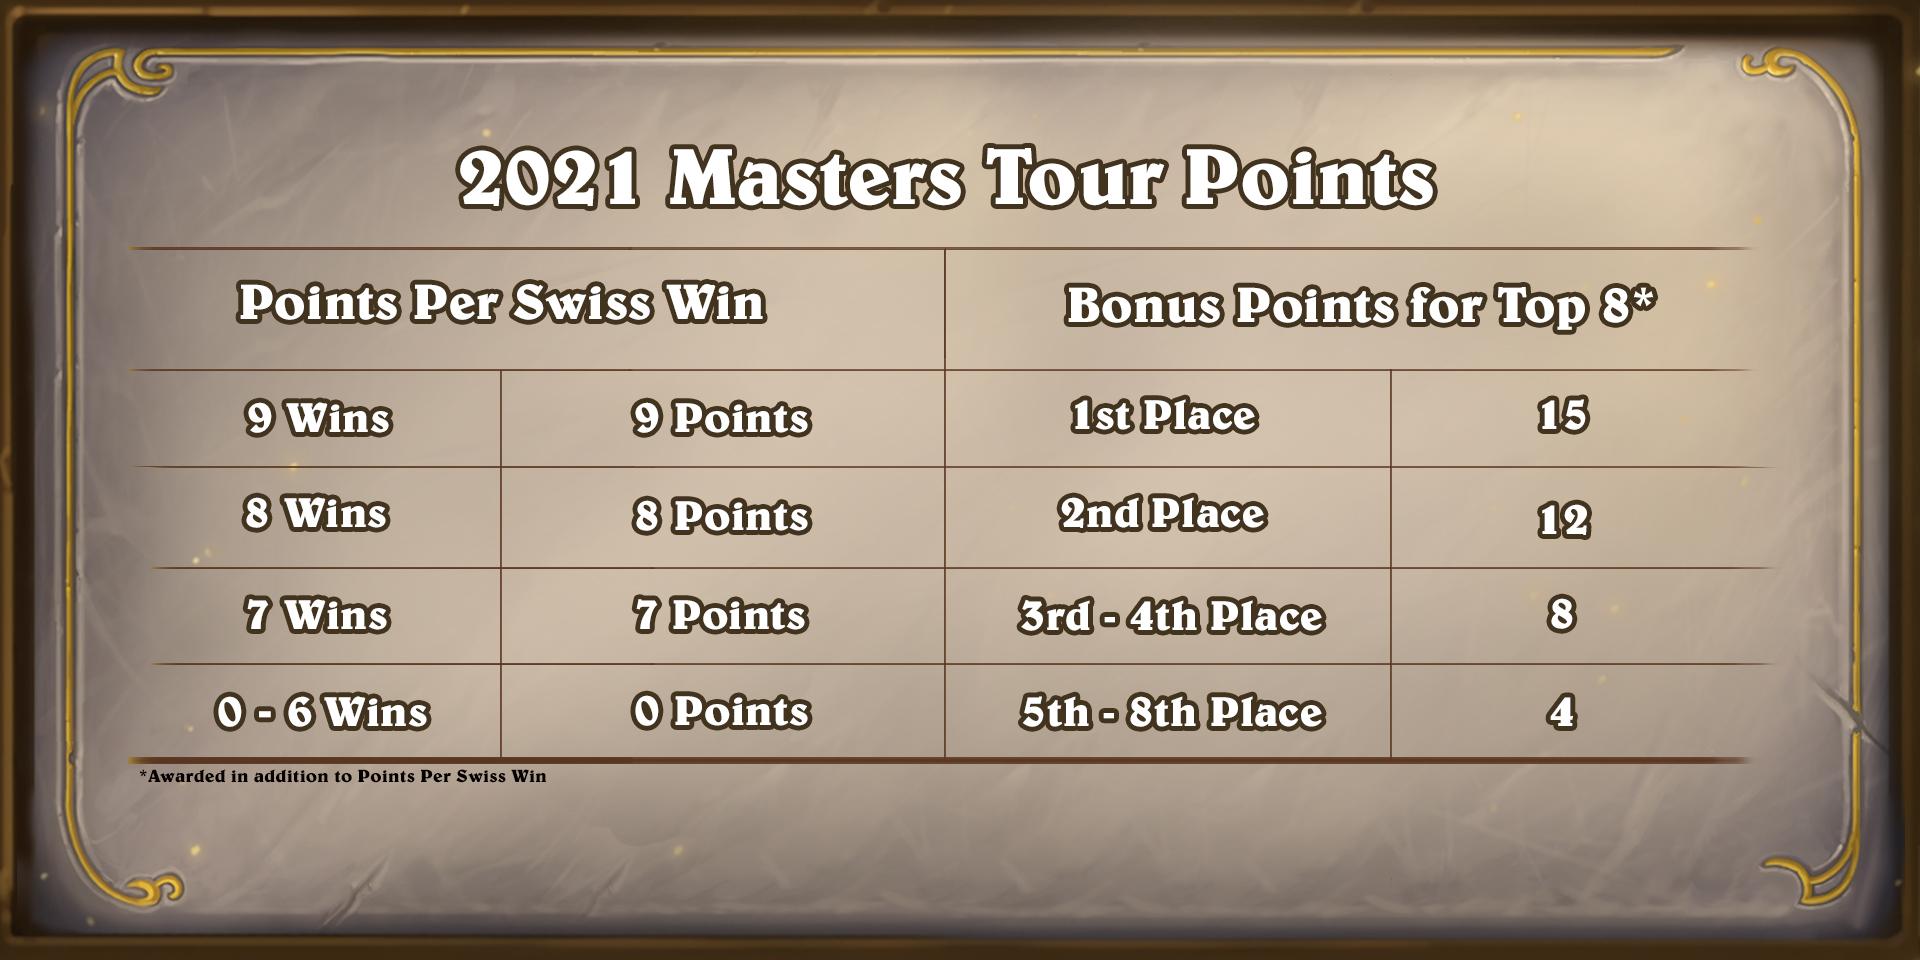 2021 Masters Tour Points